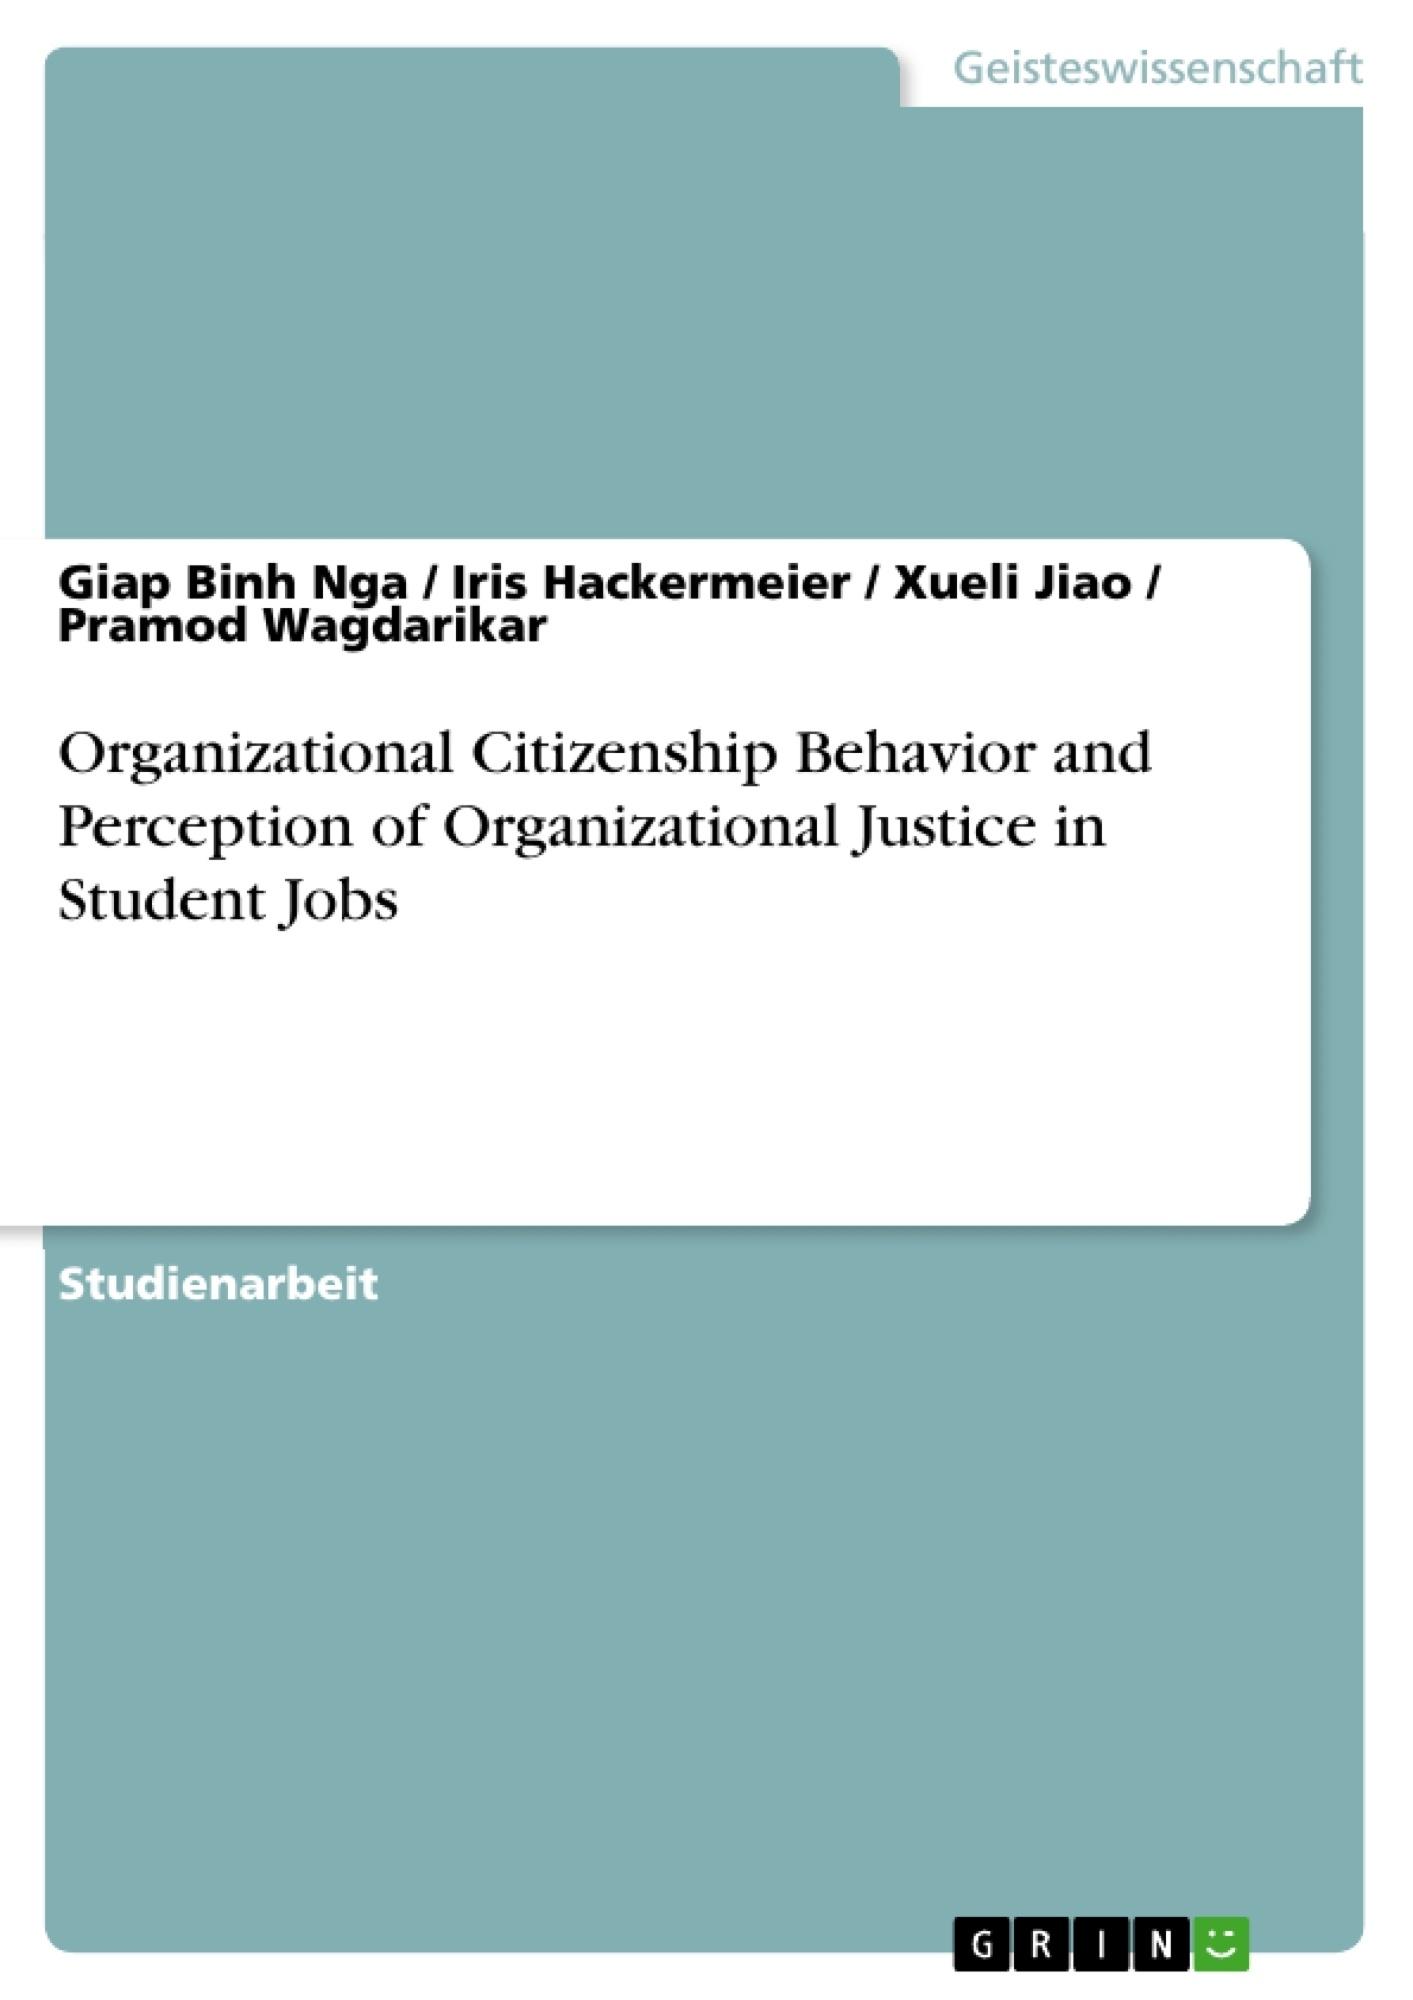 Titel: Organizational Citizenship Behavior and Perception of Organizational Justice in Student Jobs